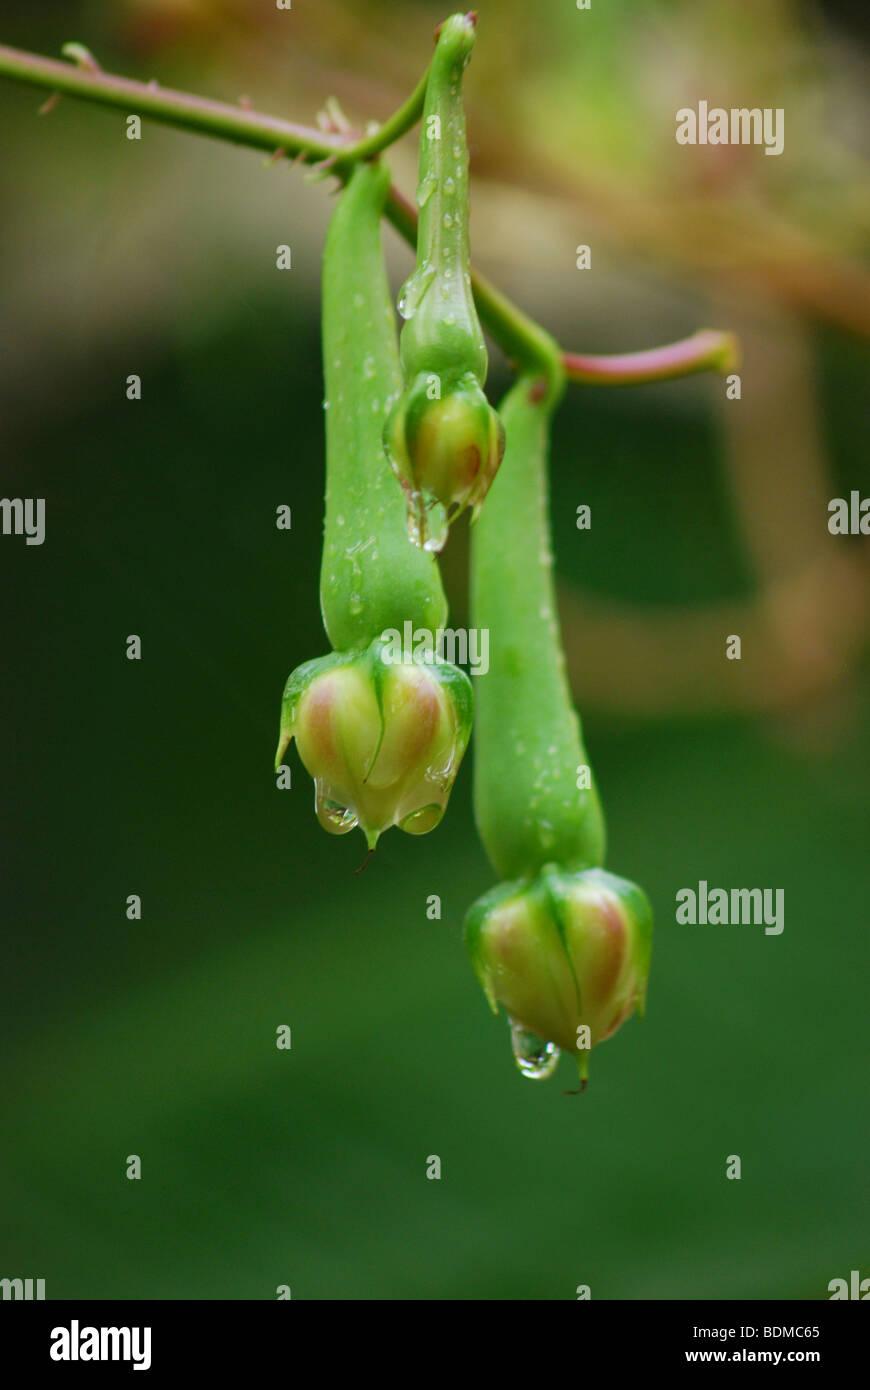 nithyavazhuthana(small brinjal) - Stock Image